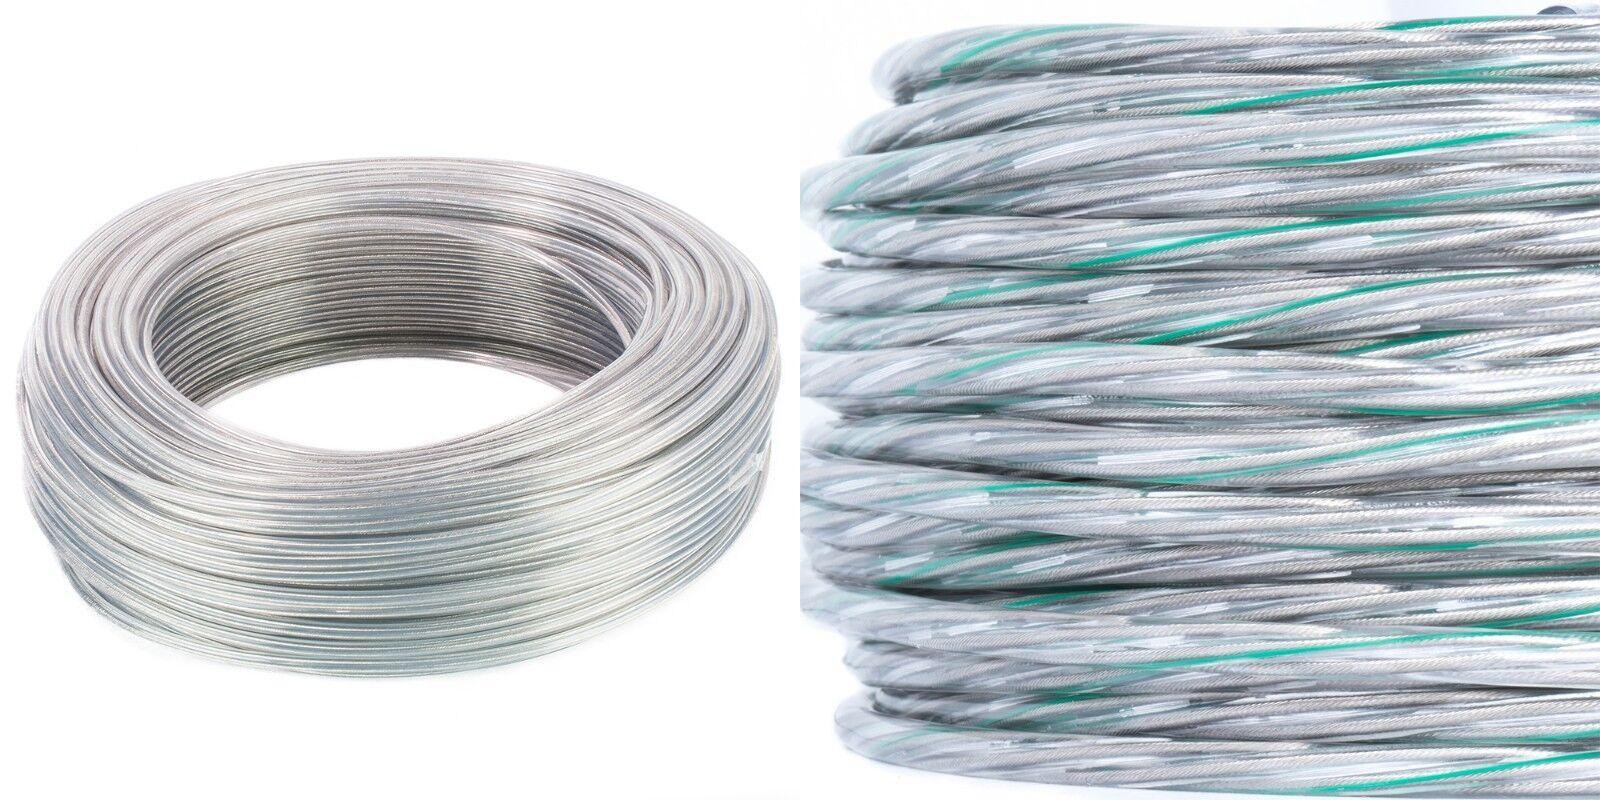 PVC PVC Lampenkabel Schlauchleitung Rundkabel transparent 2x0,75mm²   3x0,75mm²